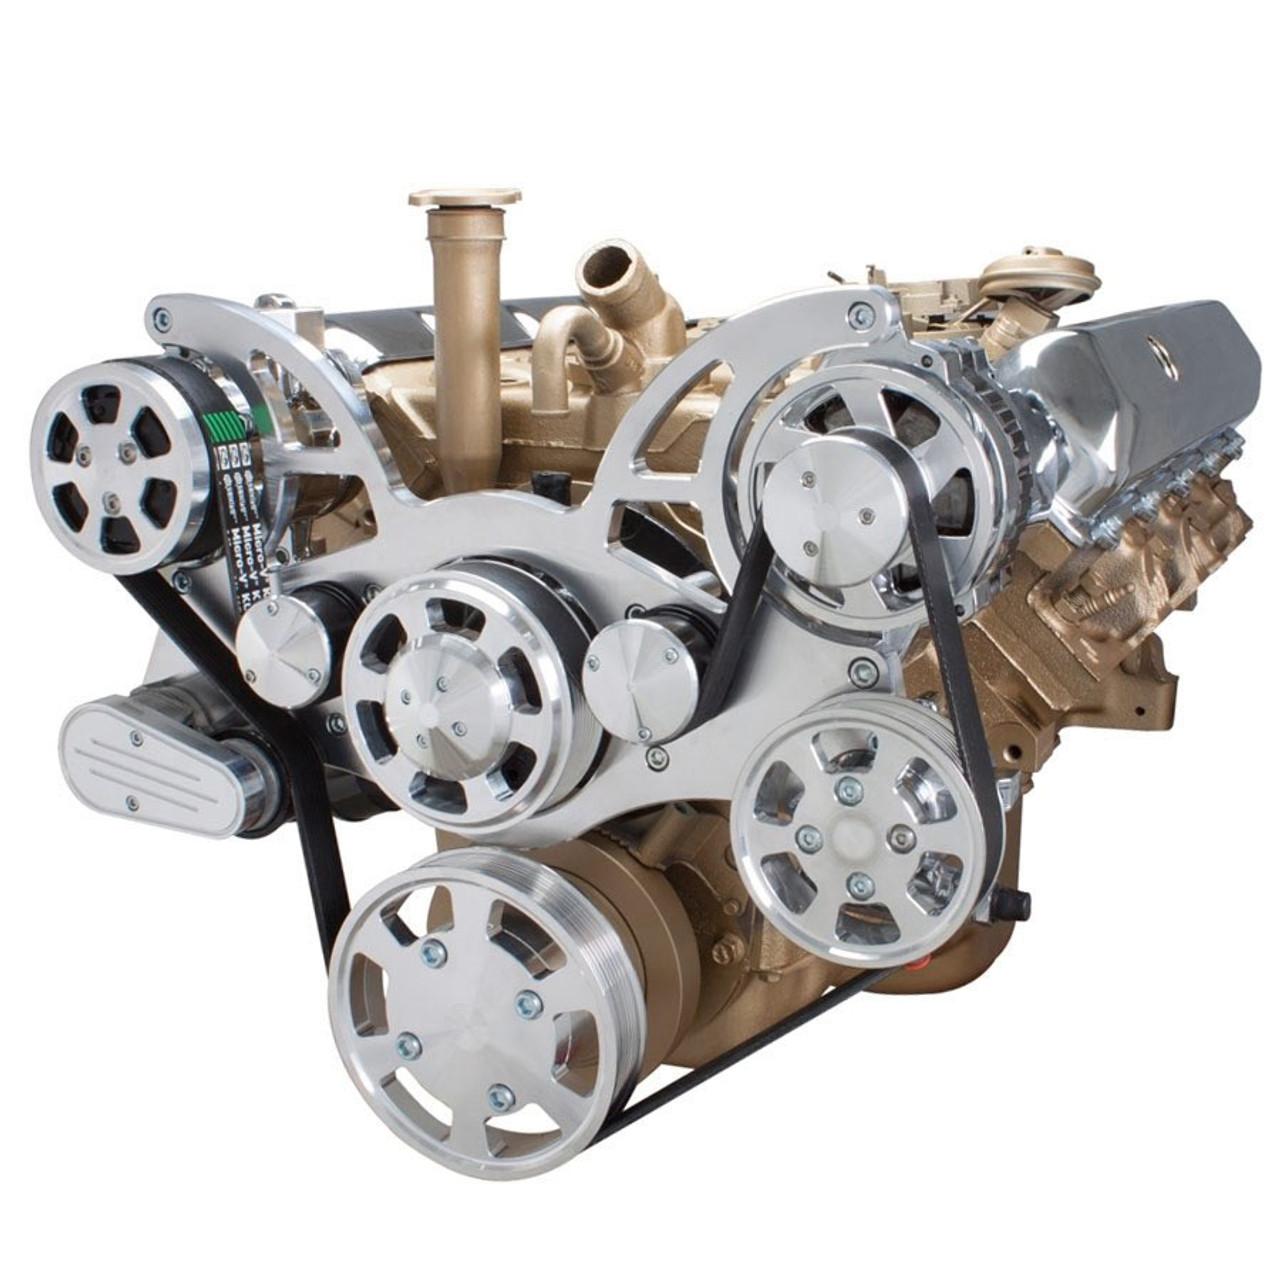 Serpentine Conversion Kit For Oldsmobile 350 455 With Ac Power. Serpentine System For Oldsmobile 350455 Ac Power Steering Alternator. Wiring. 455 Olds Engine Belt Diagram At Scoala.co